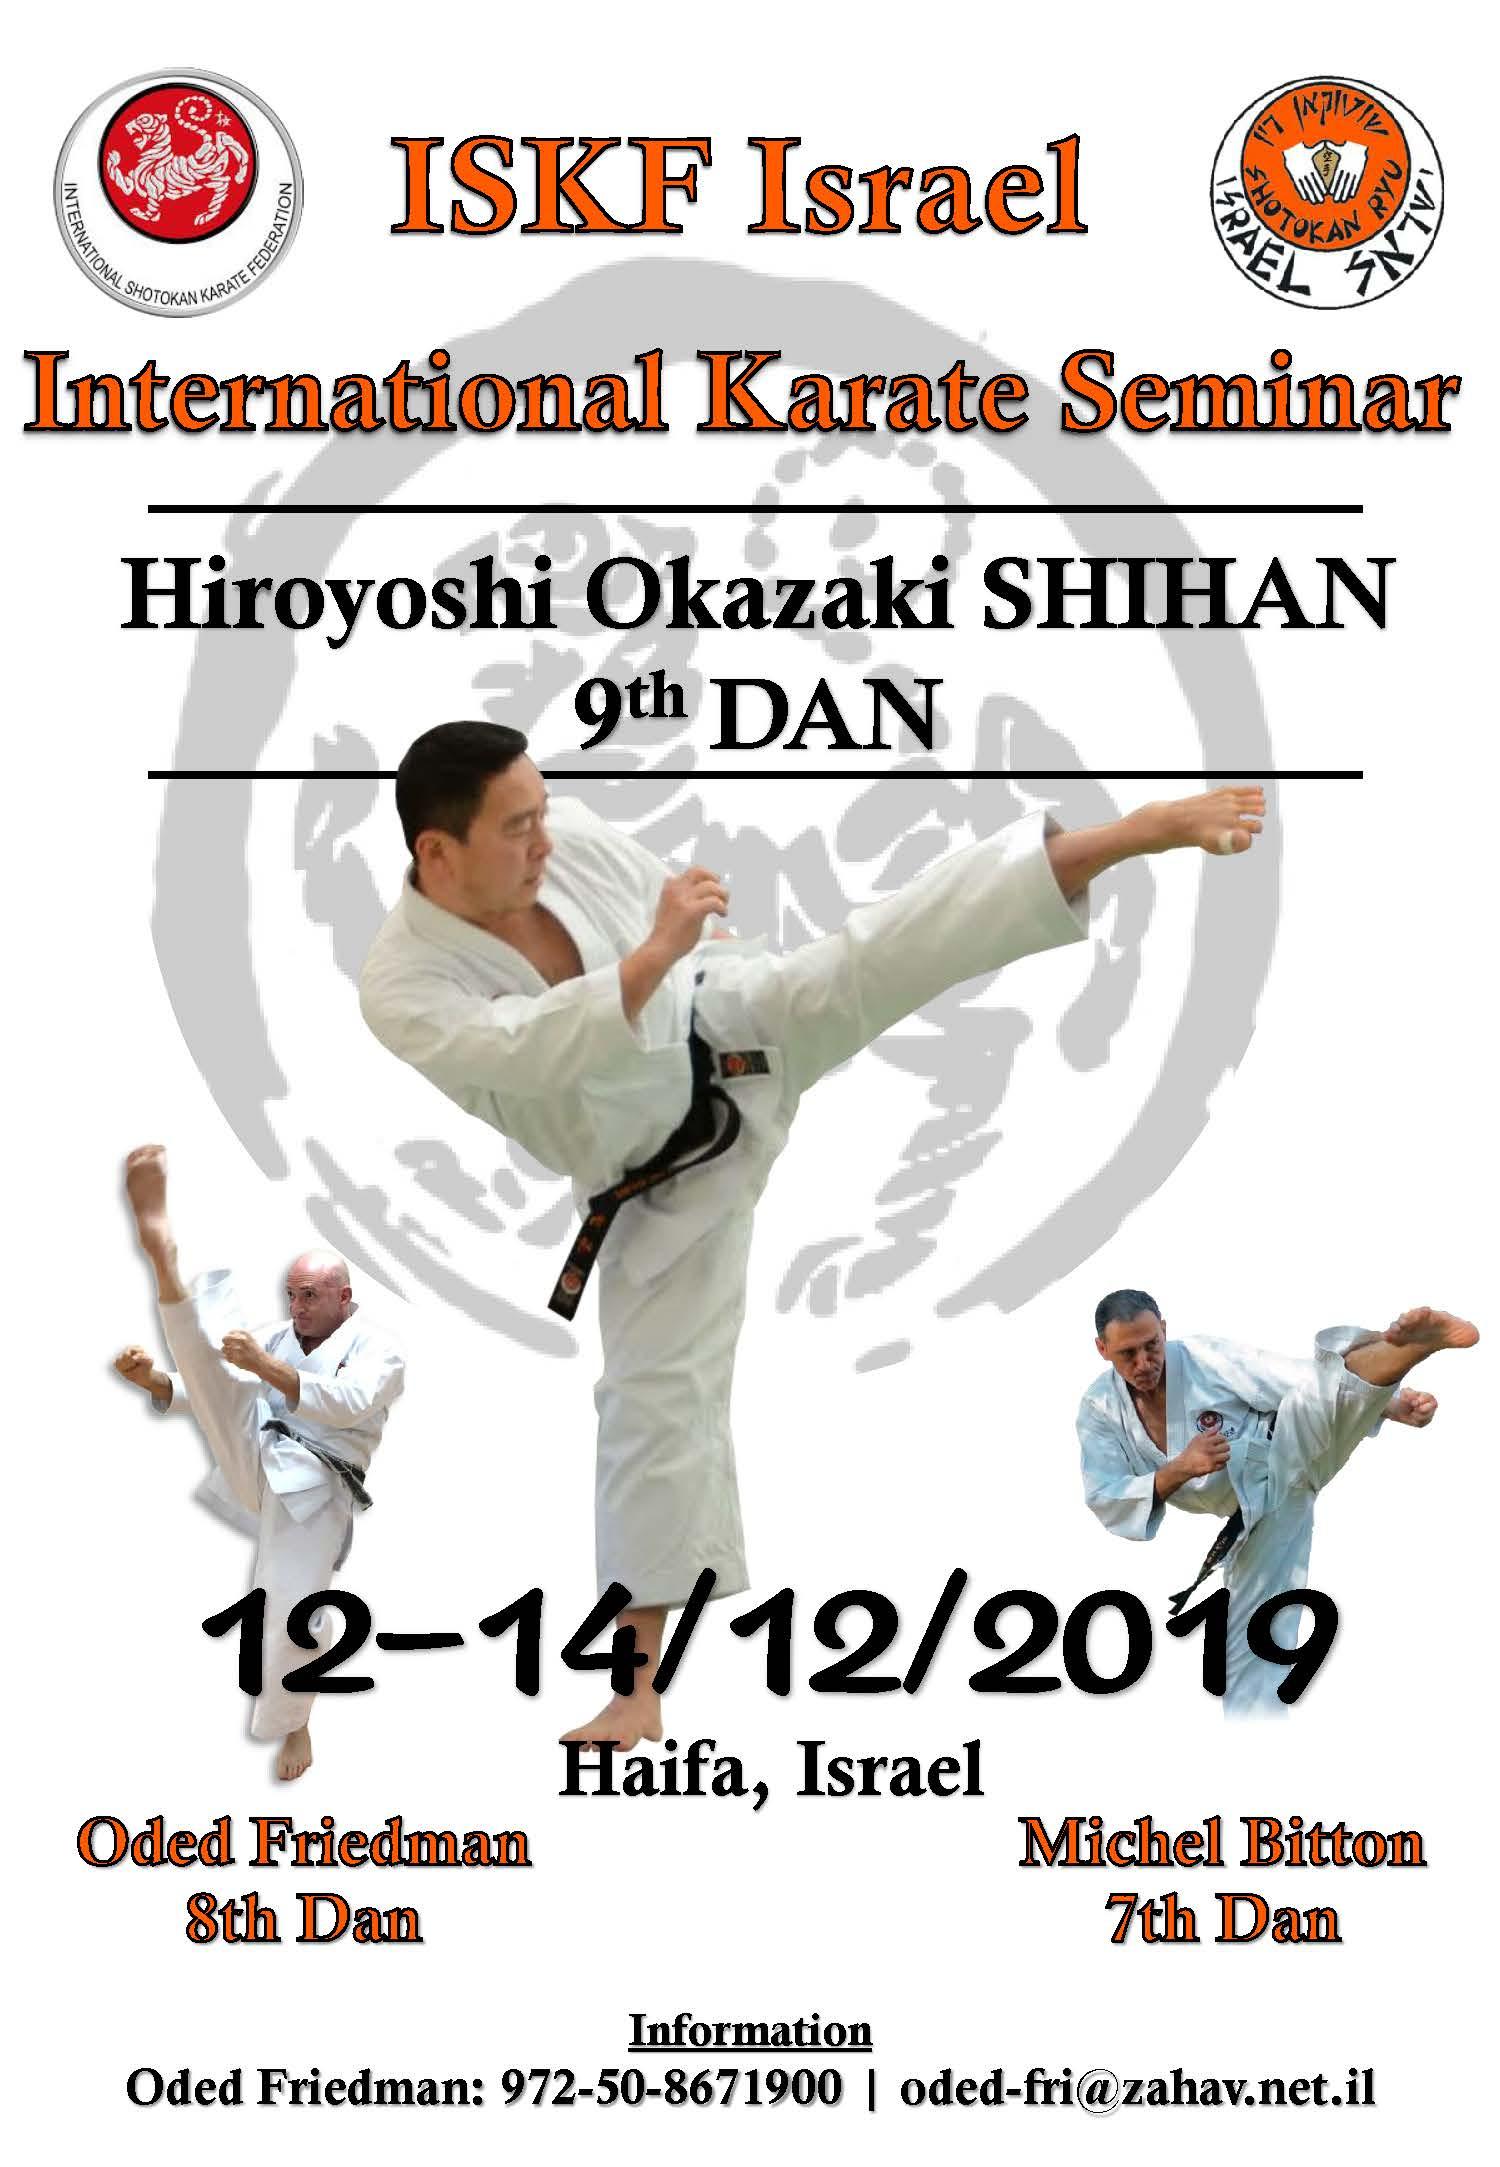 ISKF Israel Int'l Karate Seminar w/Shihan Hiroyoshi Okazaki & Sensei Oded Friedman @ Haifa, ISRAEL, December 12-14, 2019